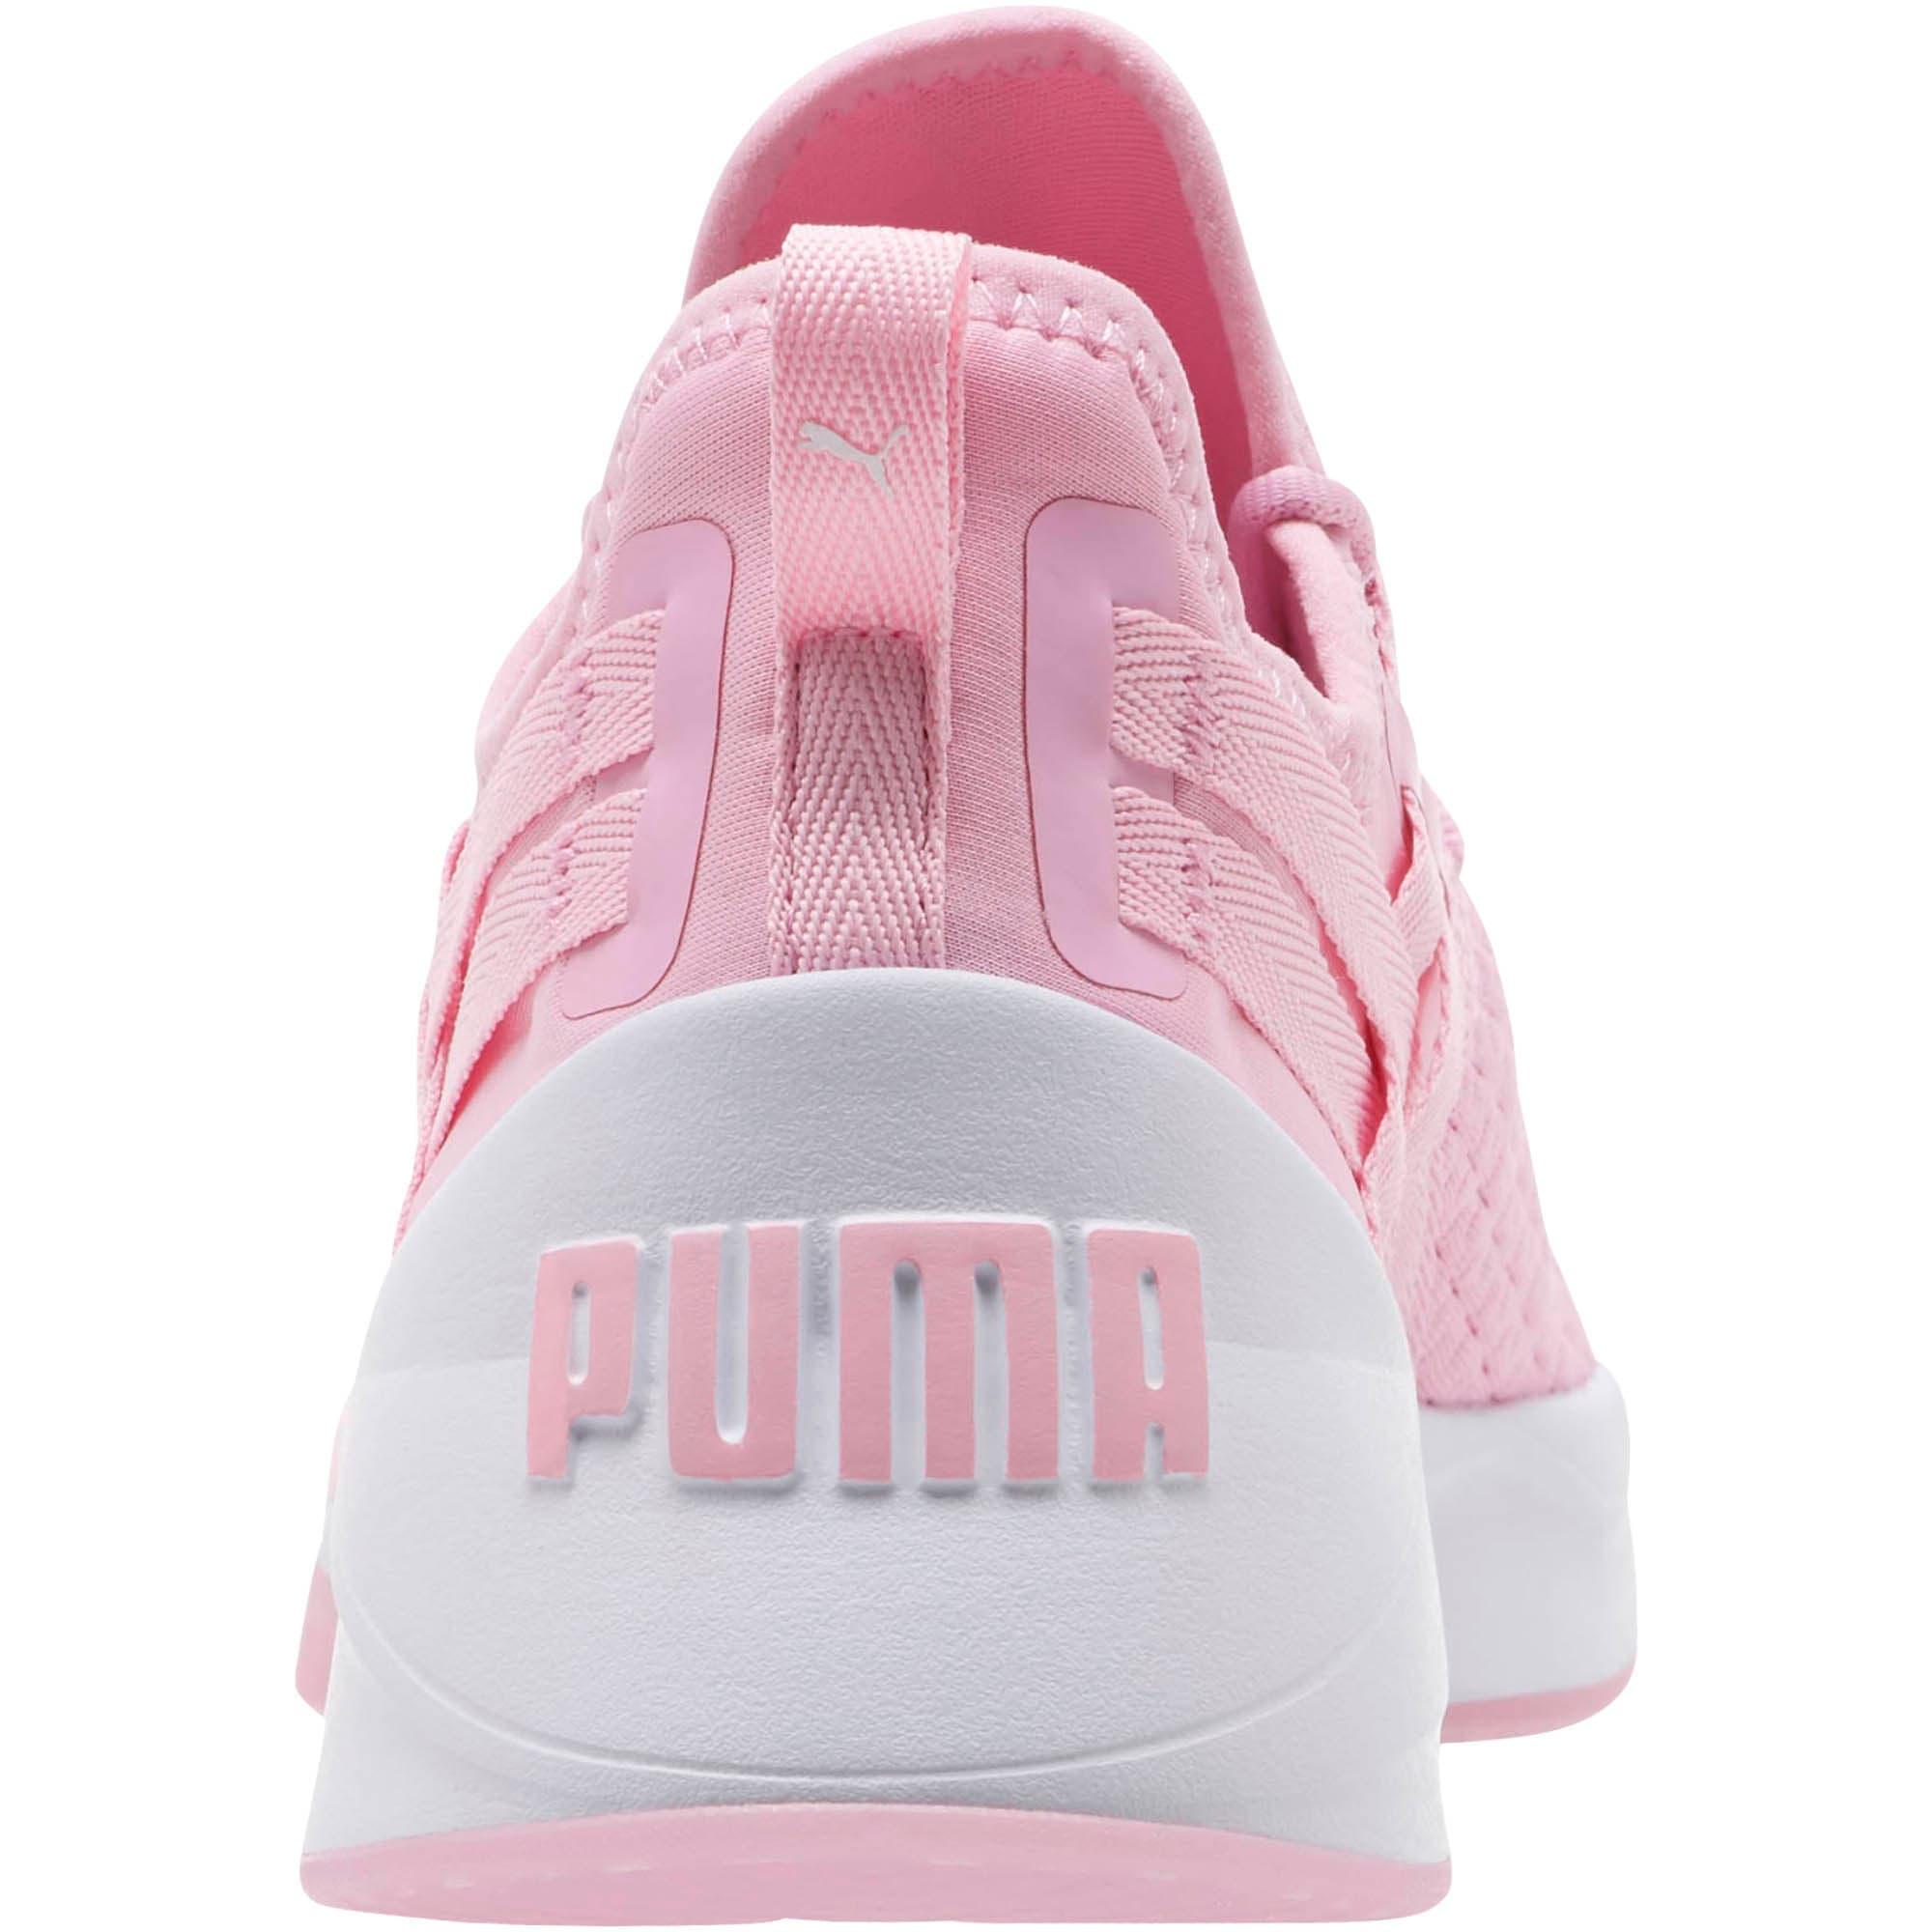 Thumbnail 3 of Jaab XT Women's Training Shoes, Lilac Sachet-Puma White, medium